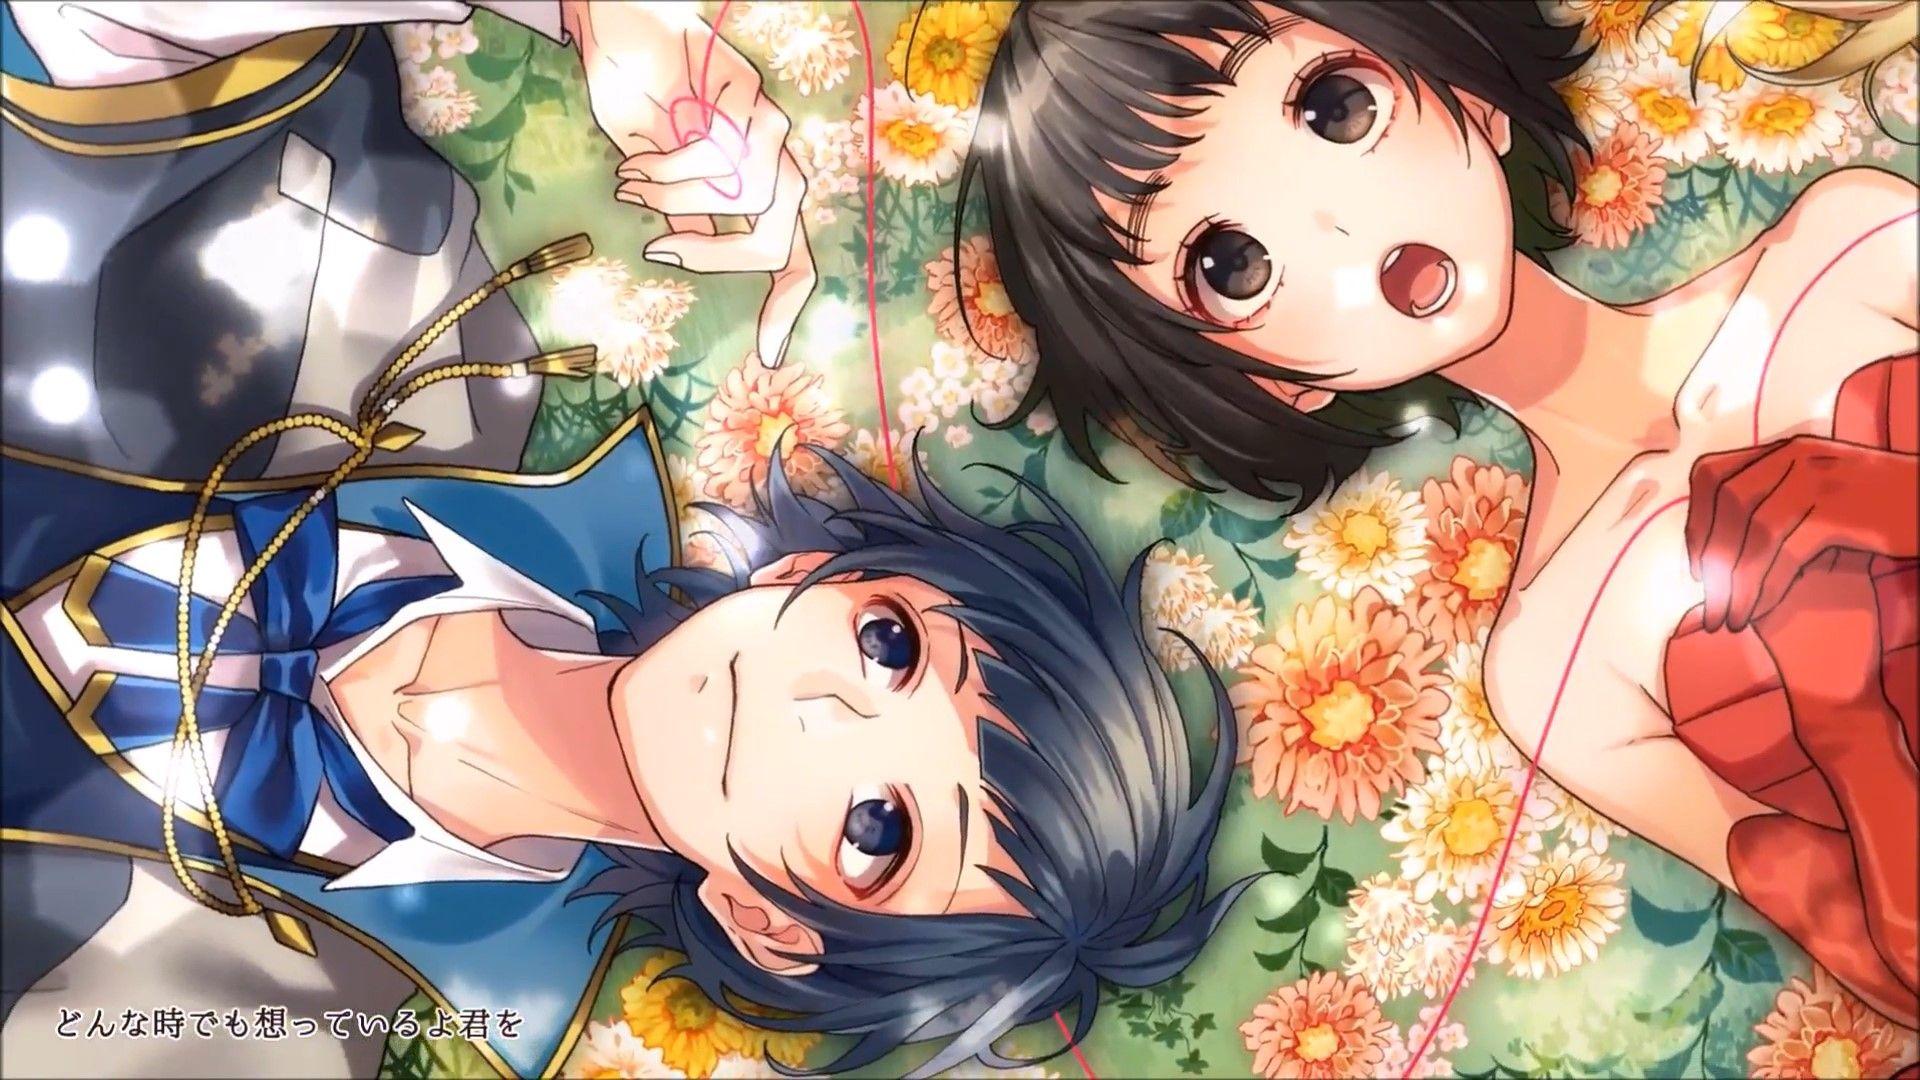 honeyworks おしゃれまとめの人気アイデア pinterest otaku girl 93 ヤマコ イラスト honeyworks イラスト ハニワ イラスト